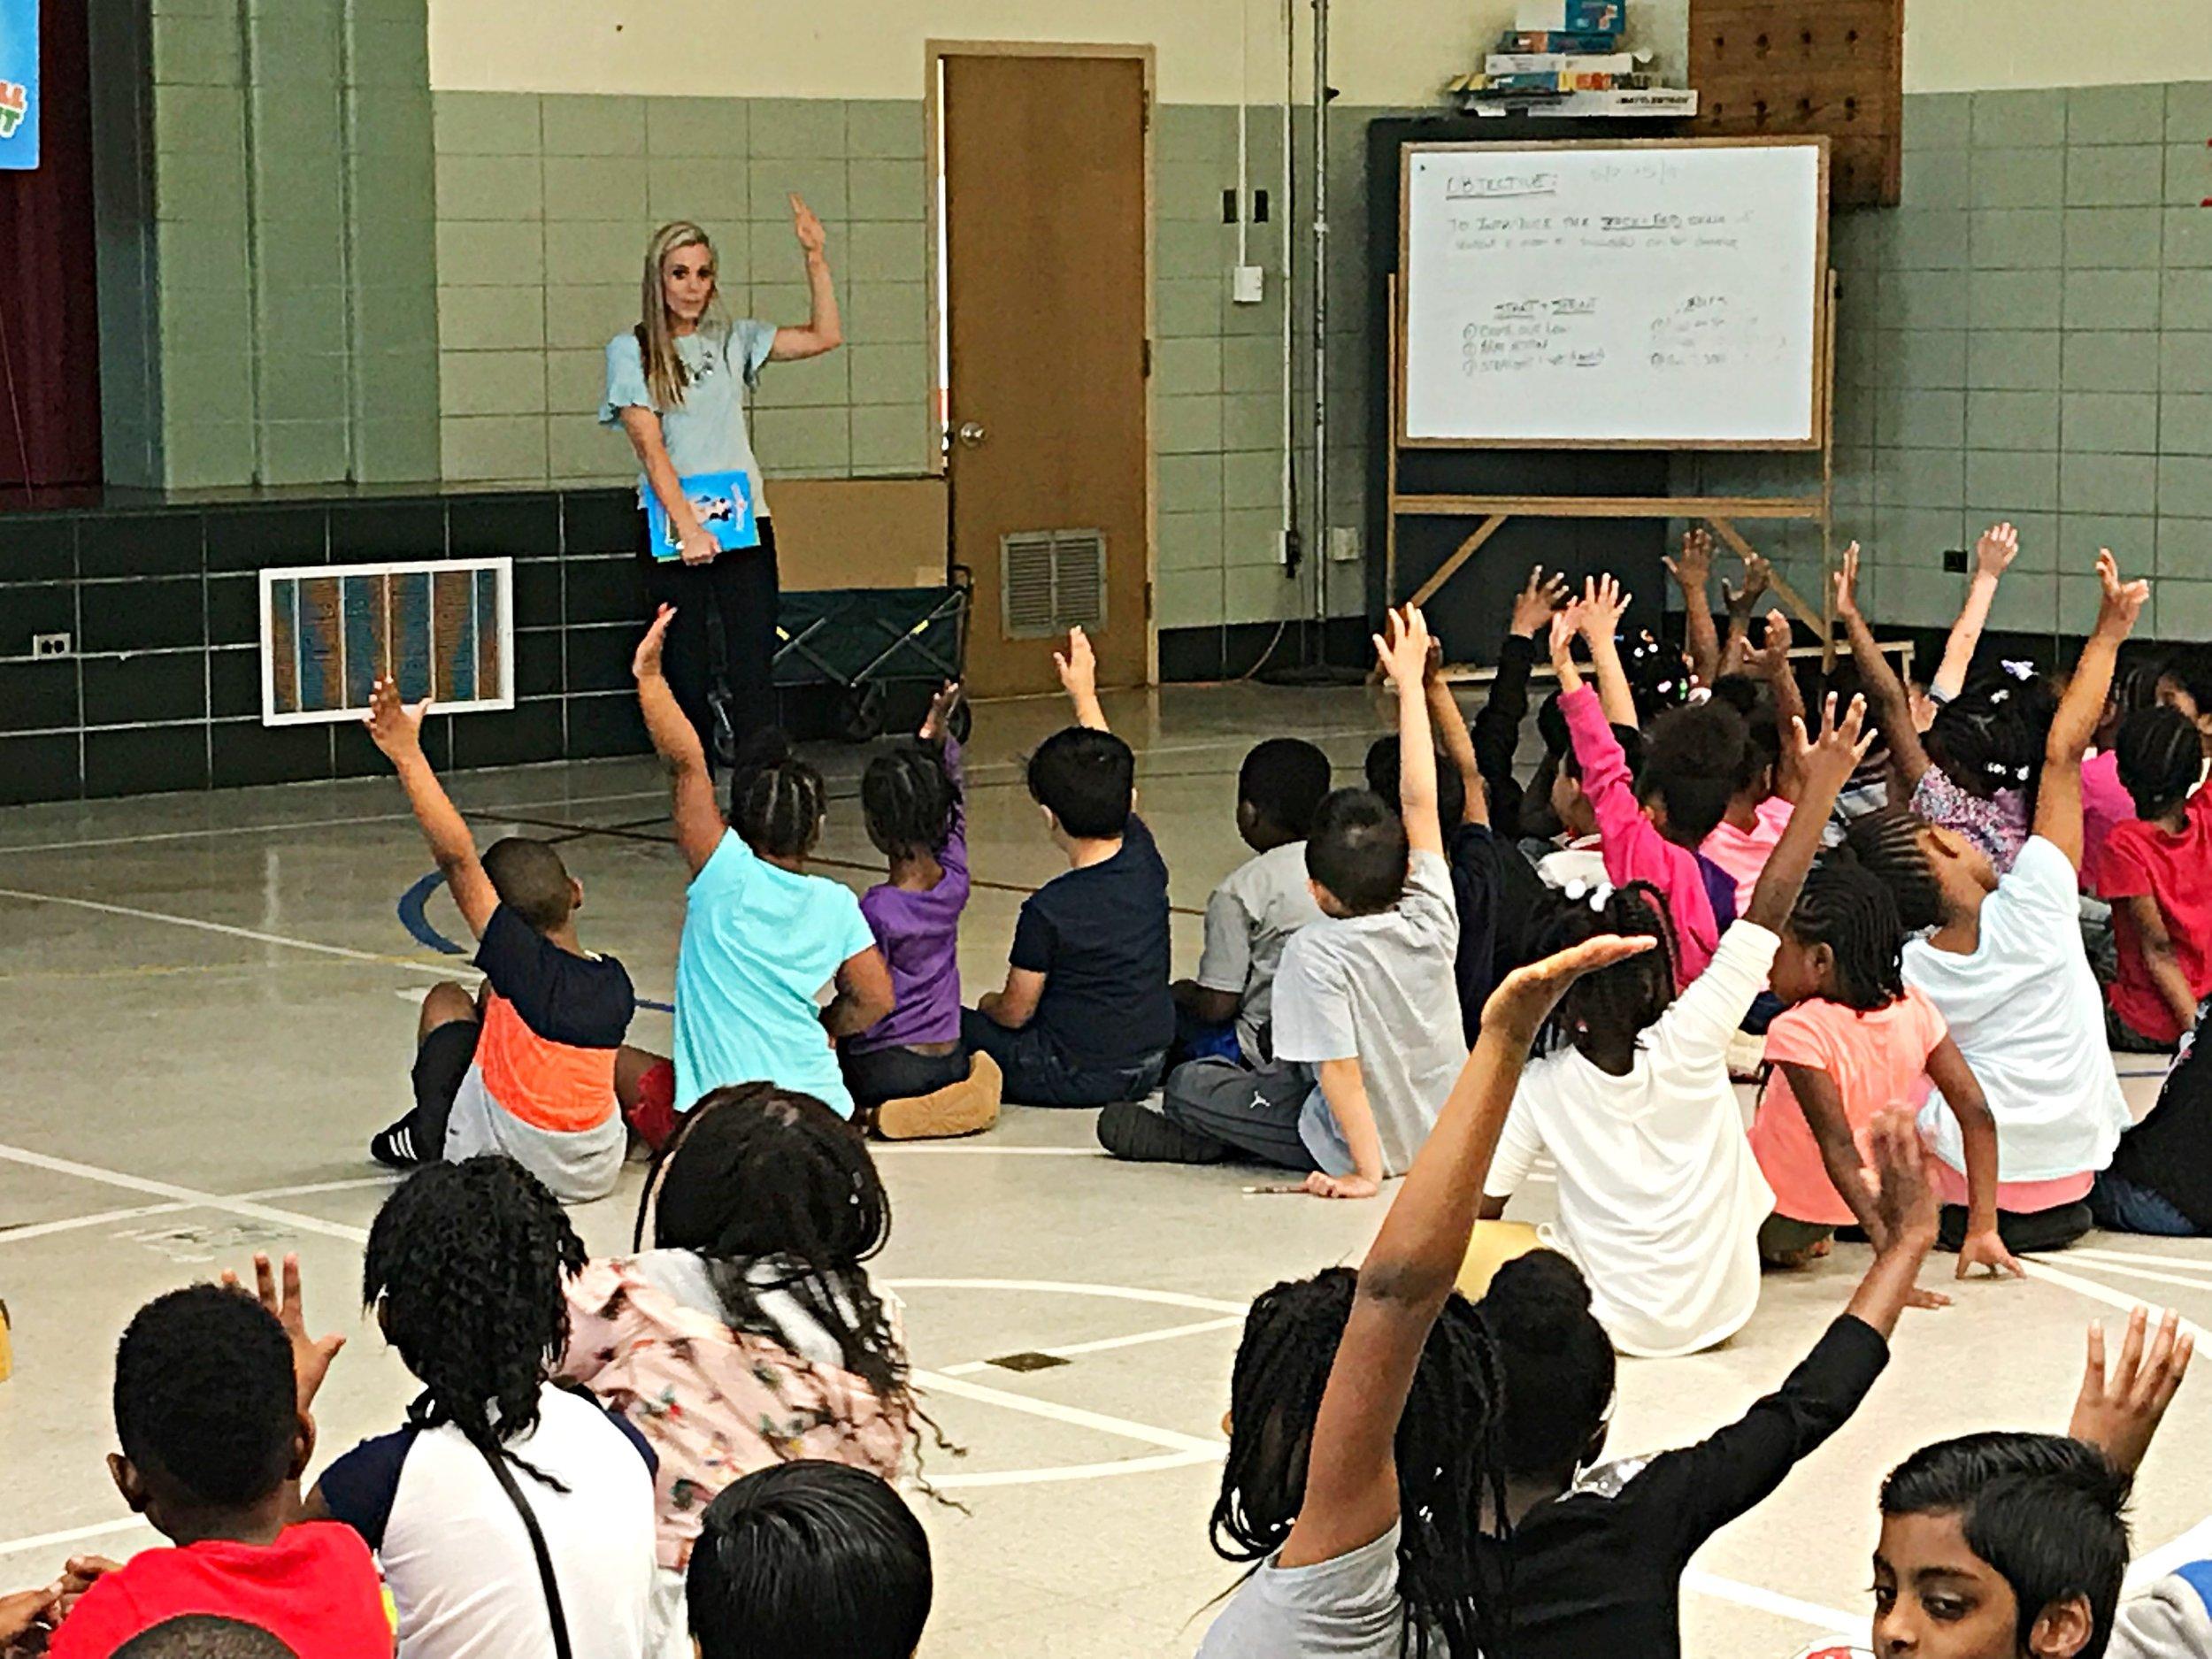 Featherbed Lane Elementary